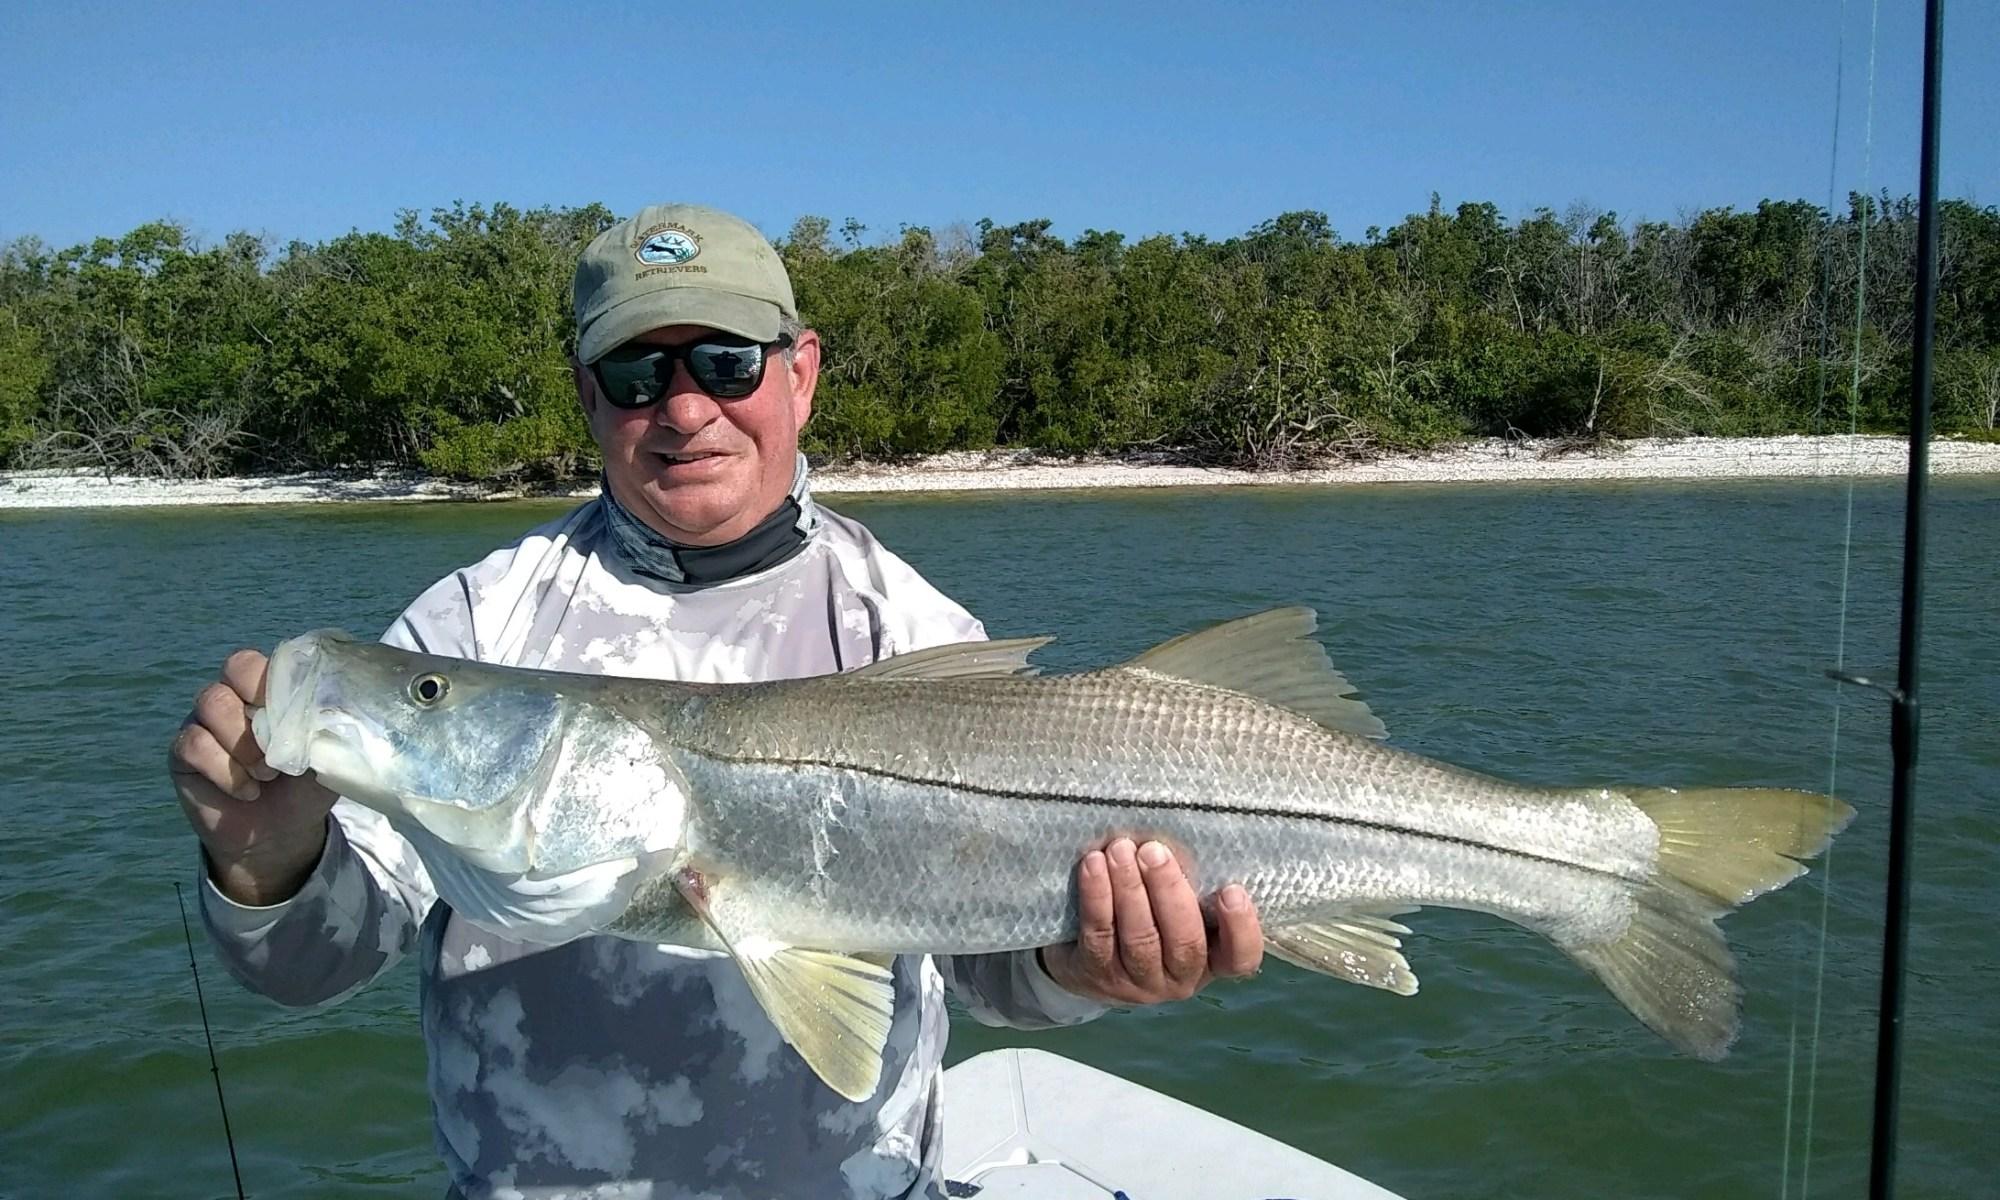 Angler holding Snook